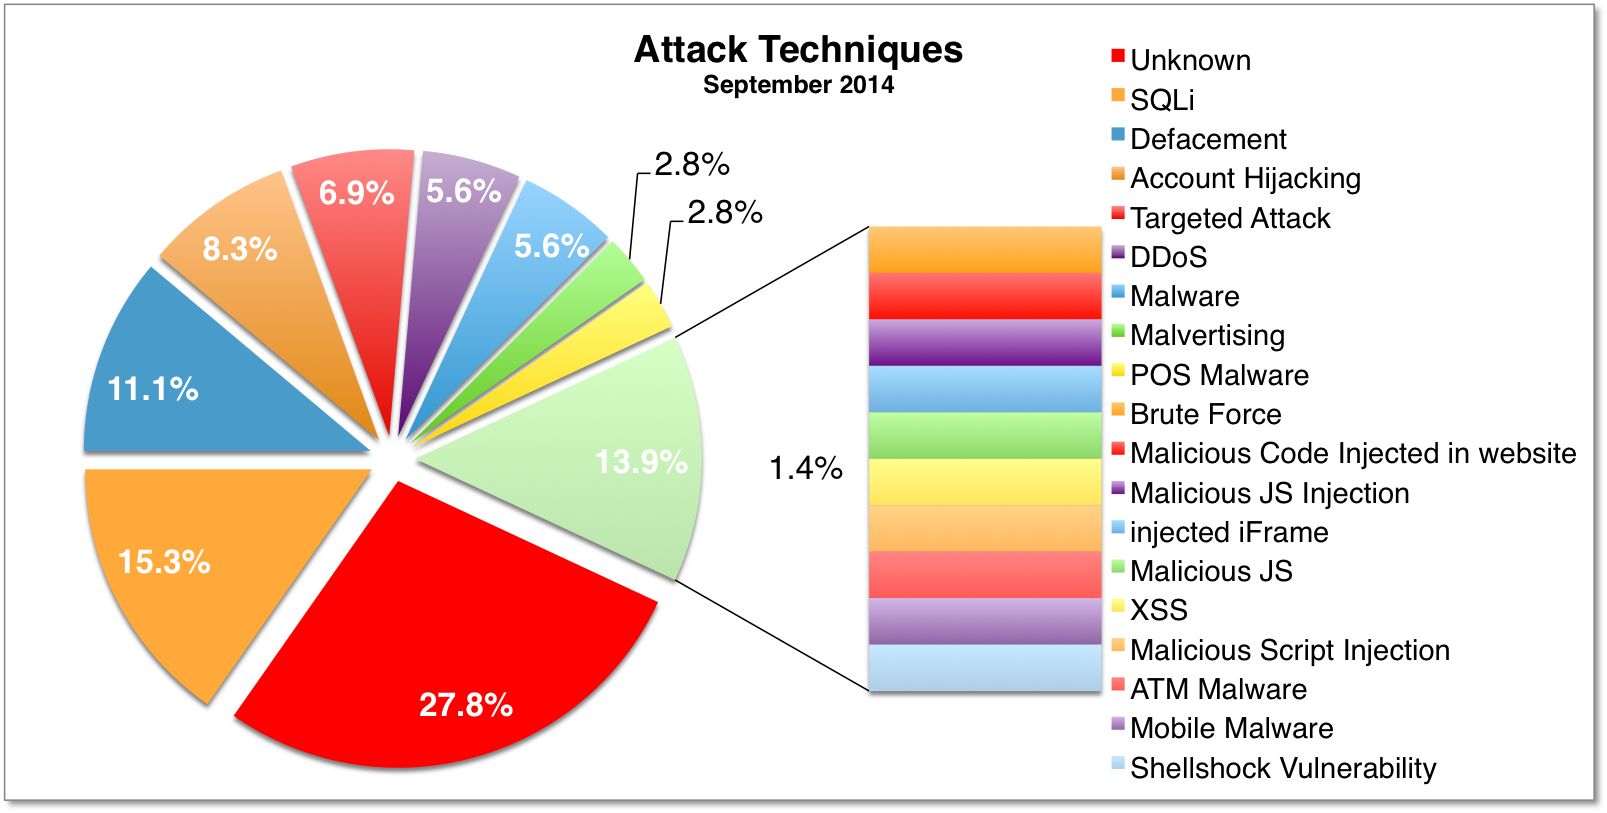 Attacks Sep 2014